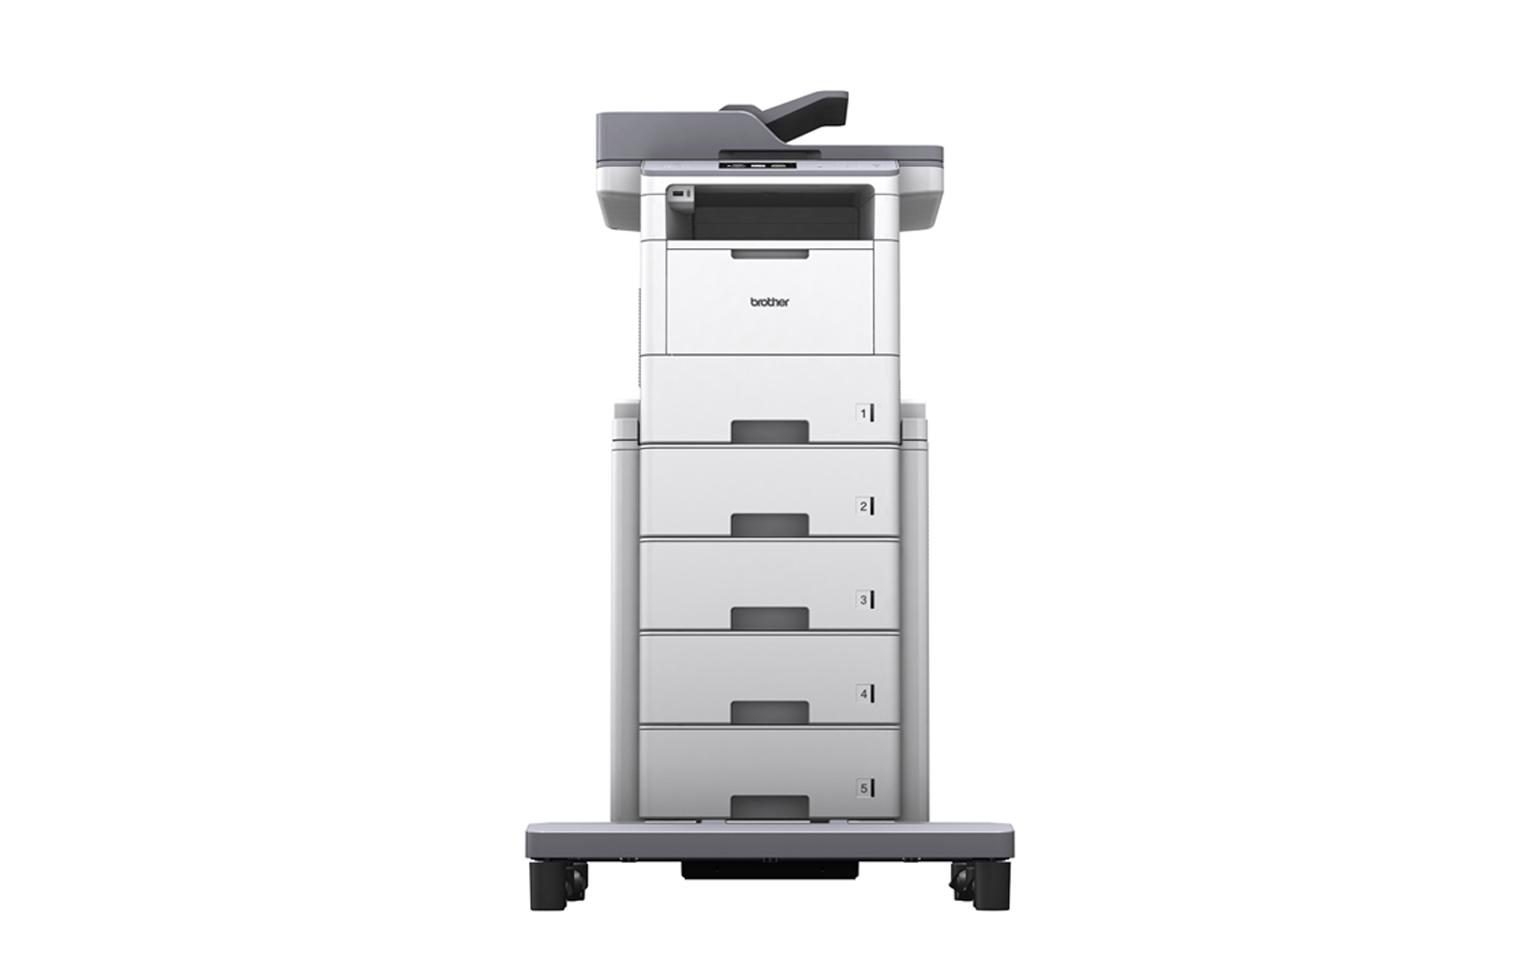 MFC-L6900DW Wireless Mono Laser Printer 5